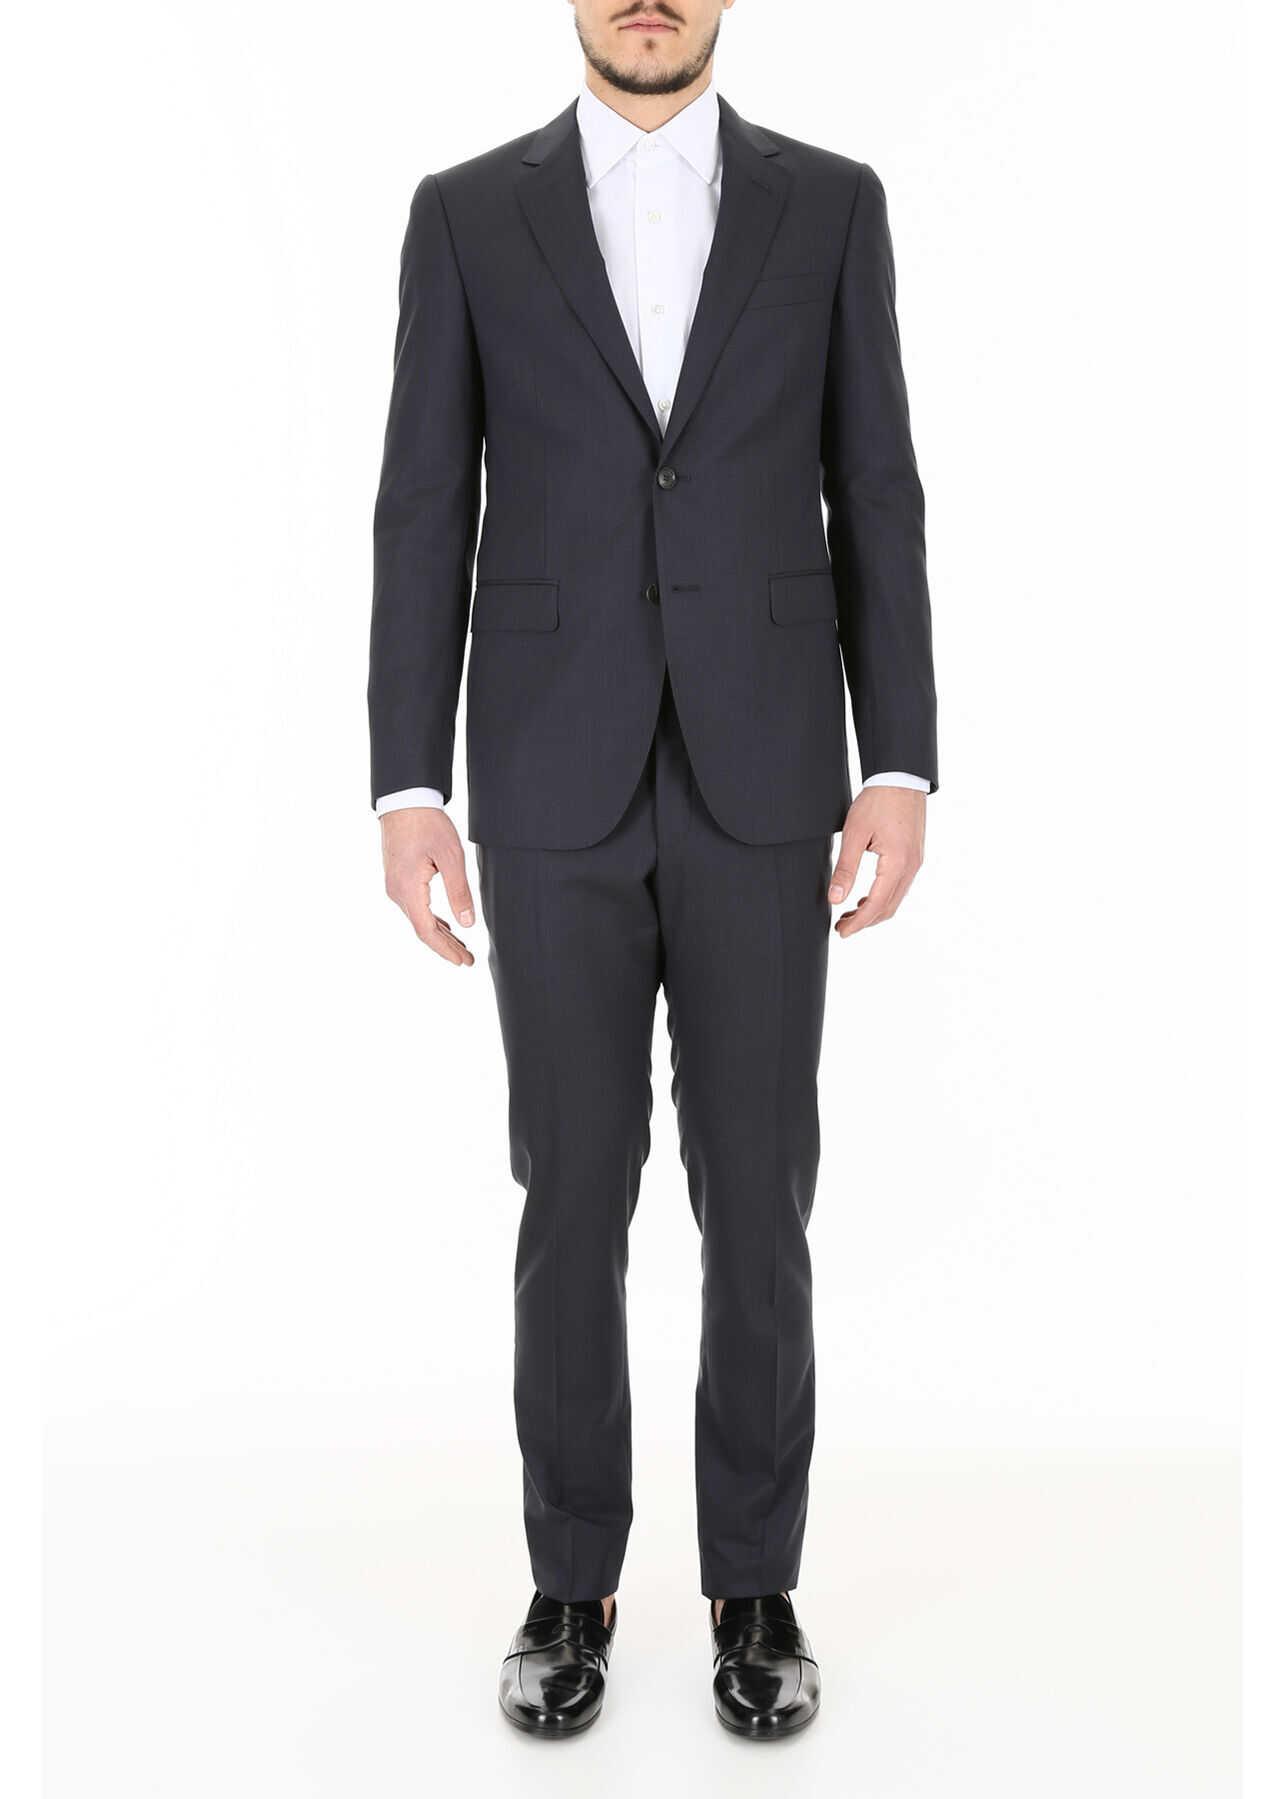 Lanvin Two-Piece Suit BLUISH GREY imagine